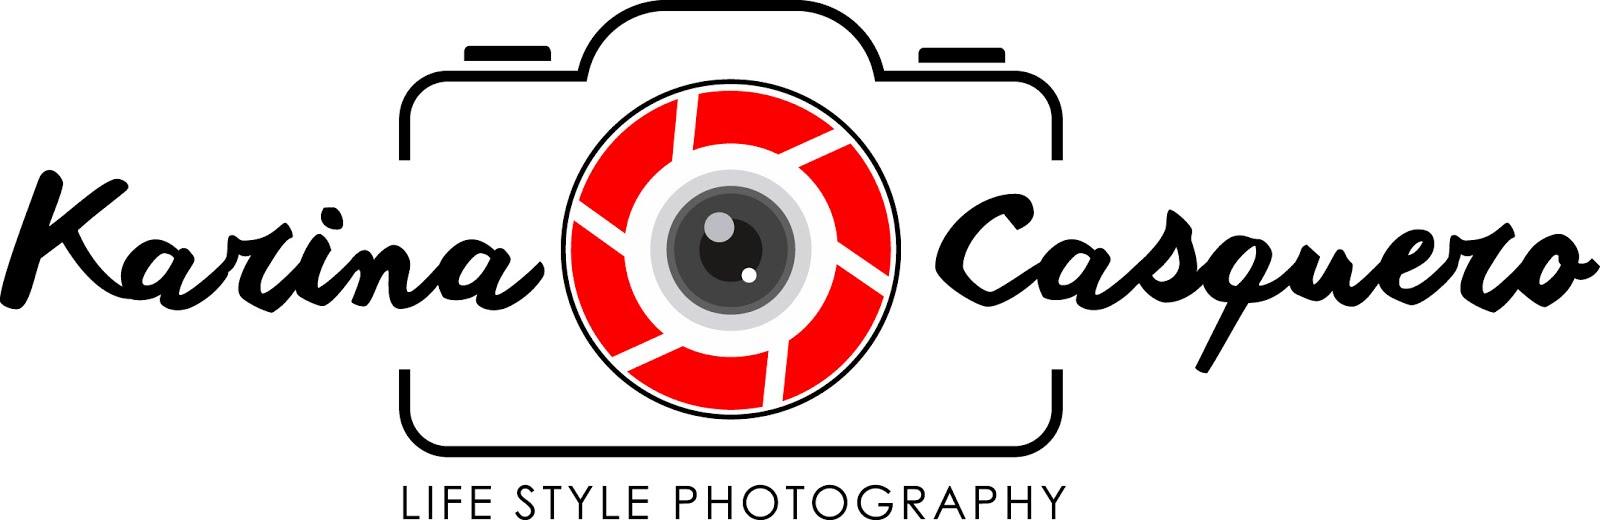 Karina Casquero Photographer